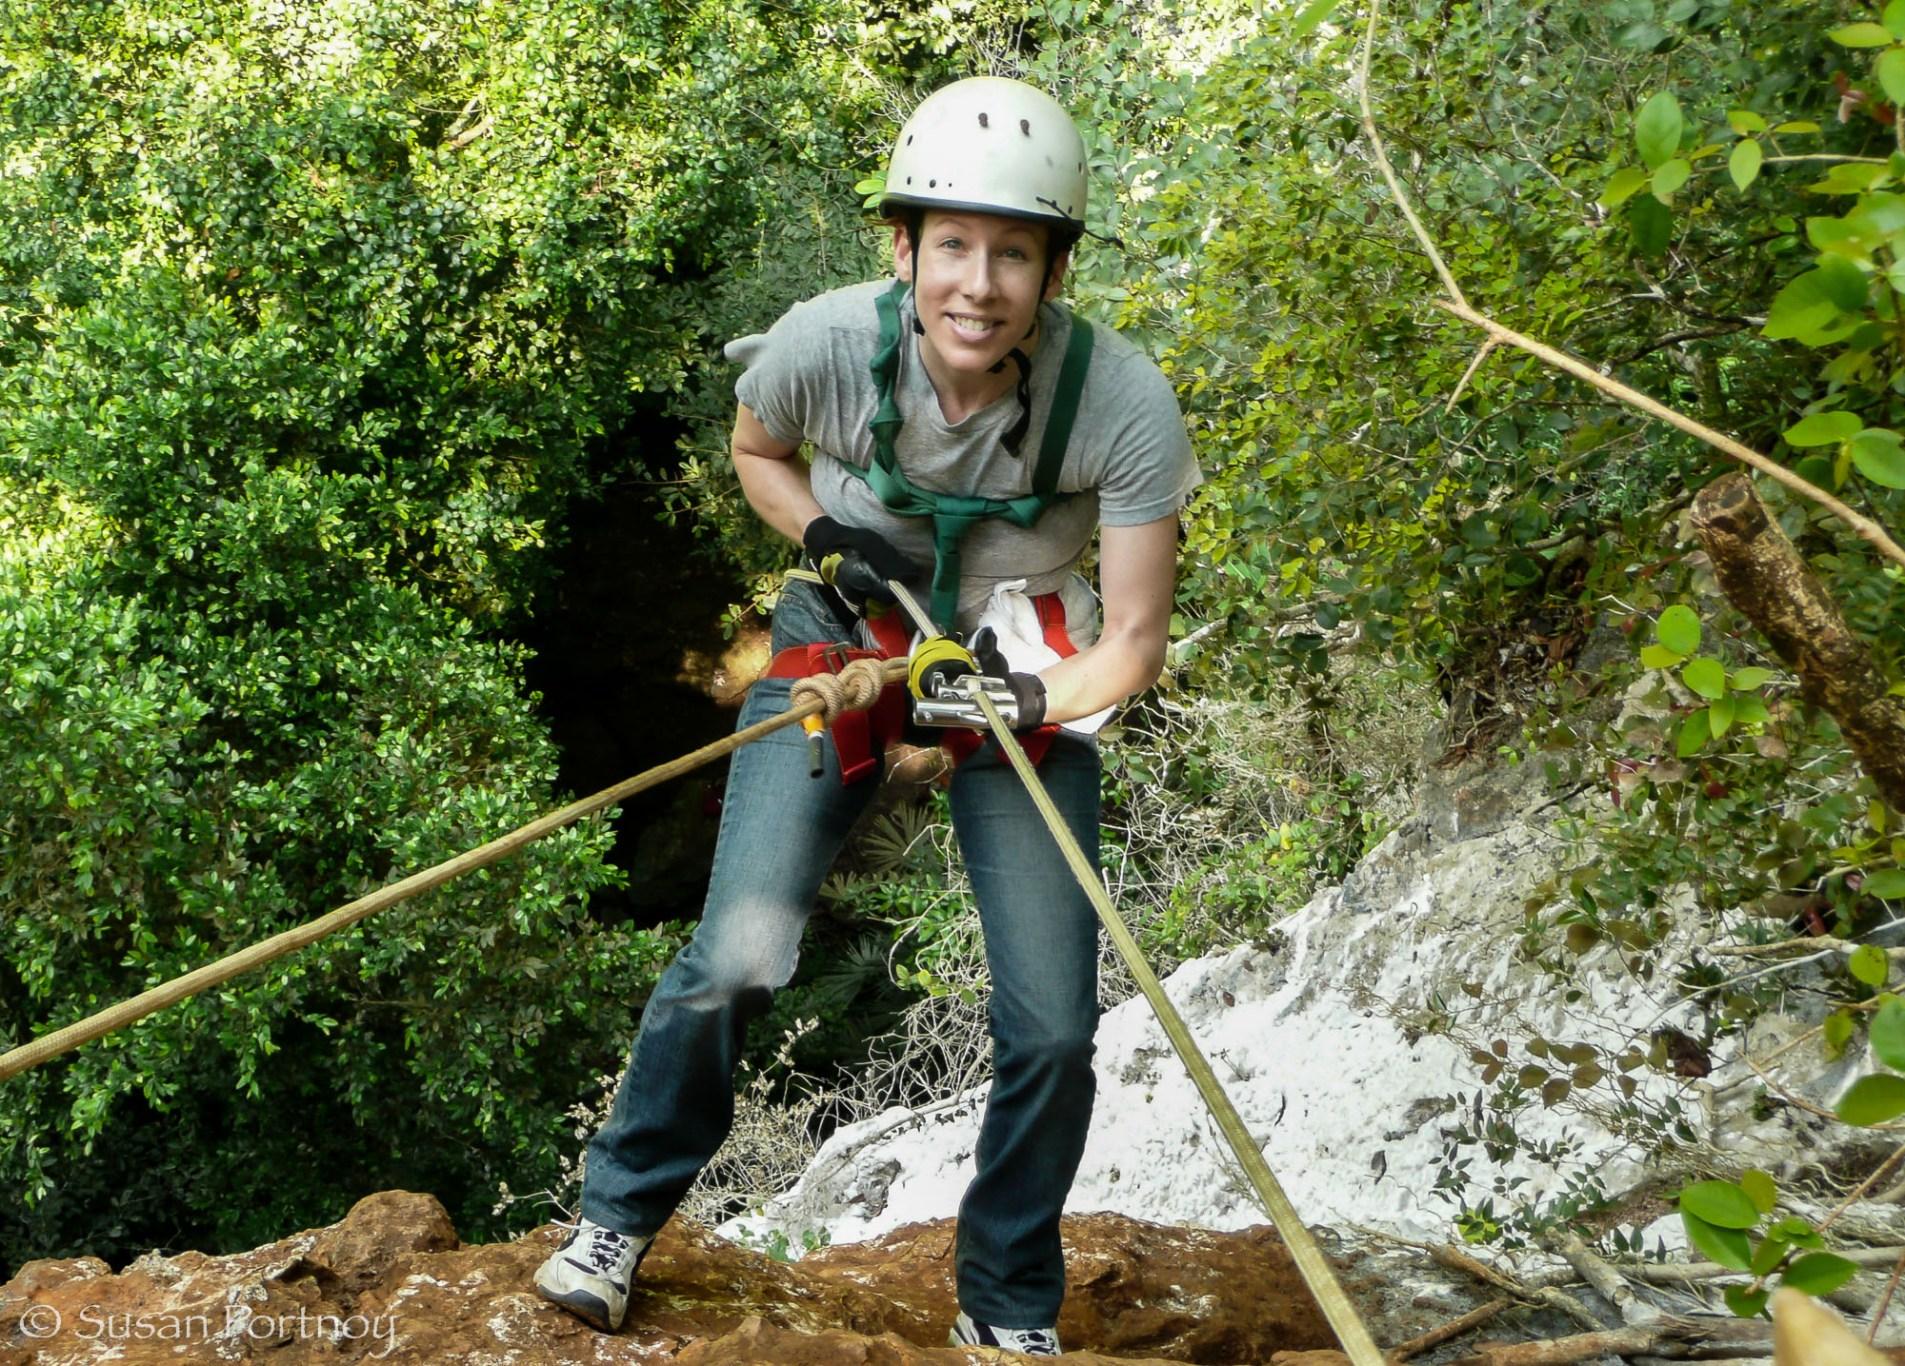 Best Travel Advice: -Susan PortnoyBlack Hole Drop, Belize